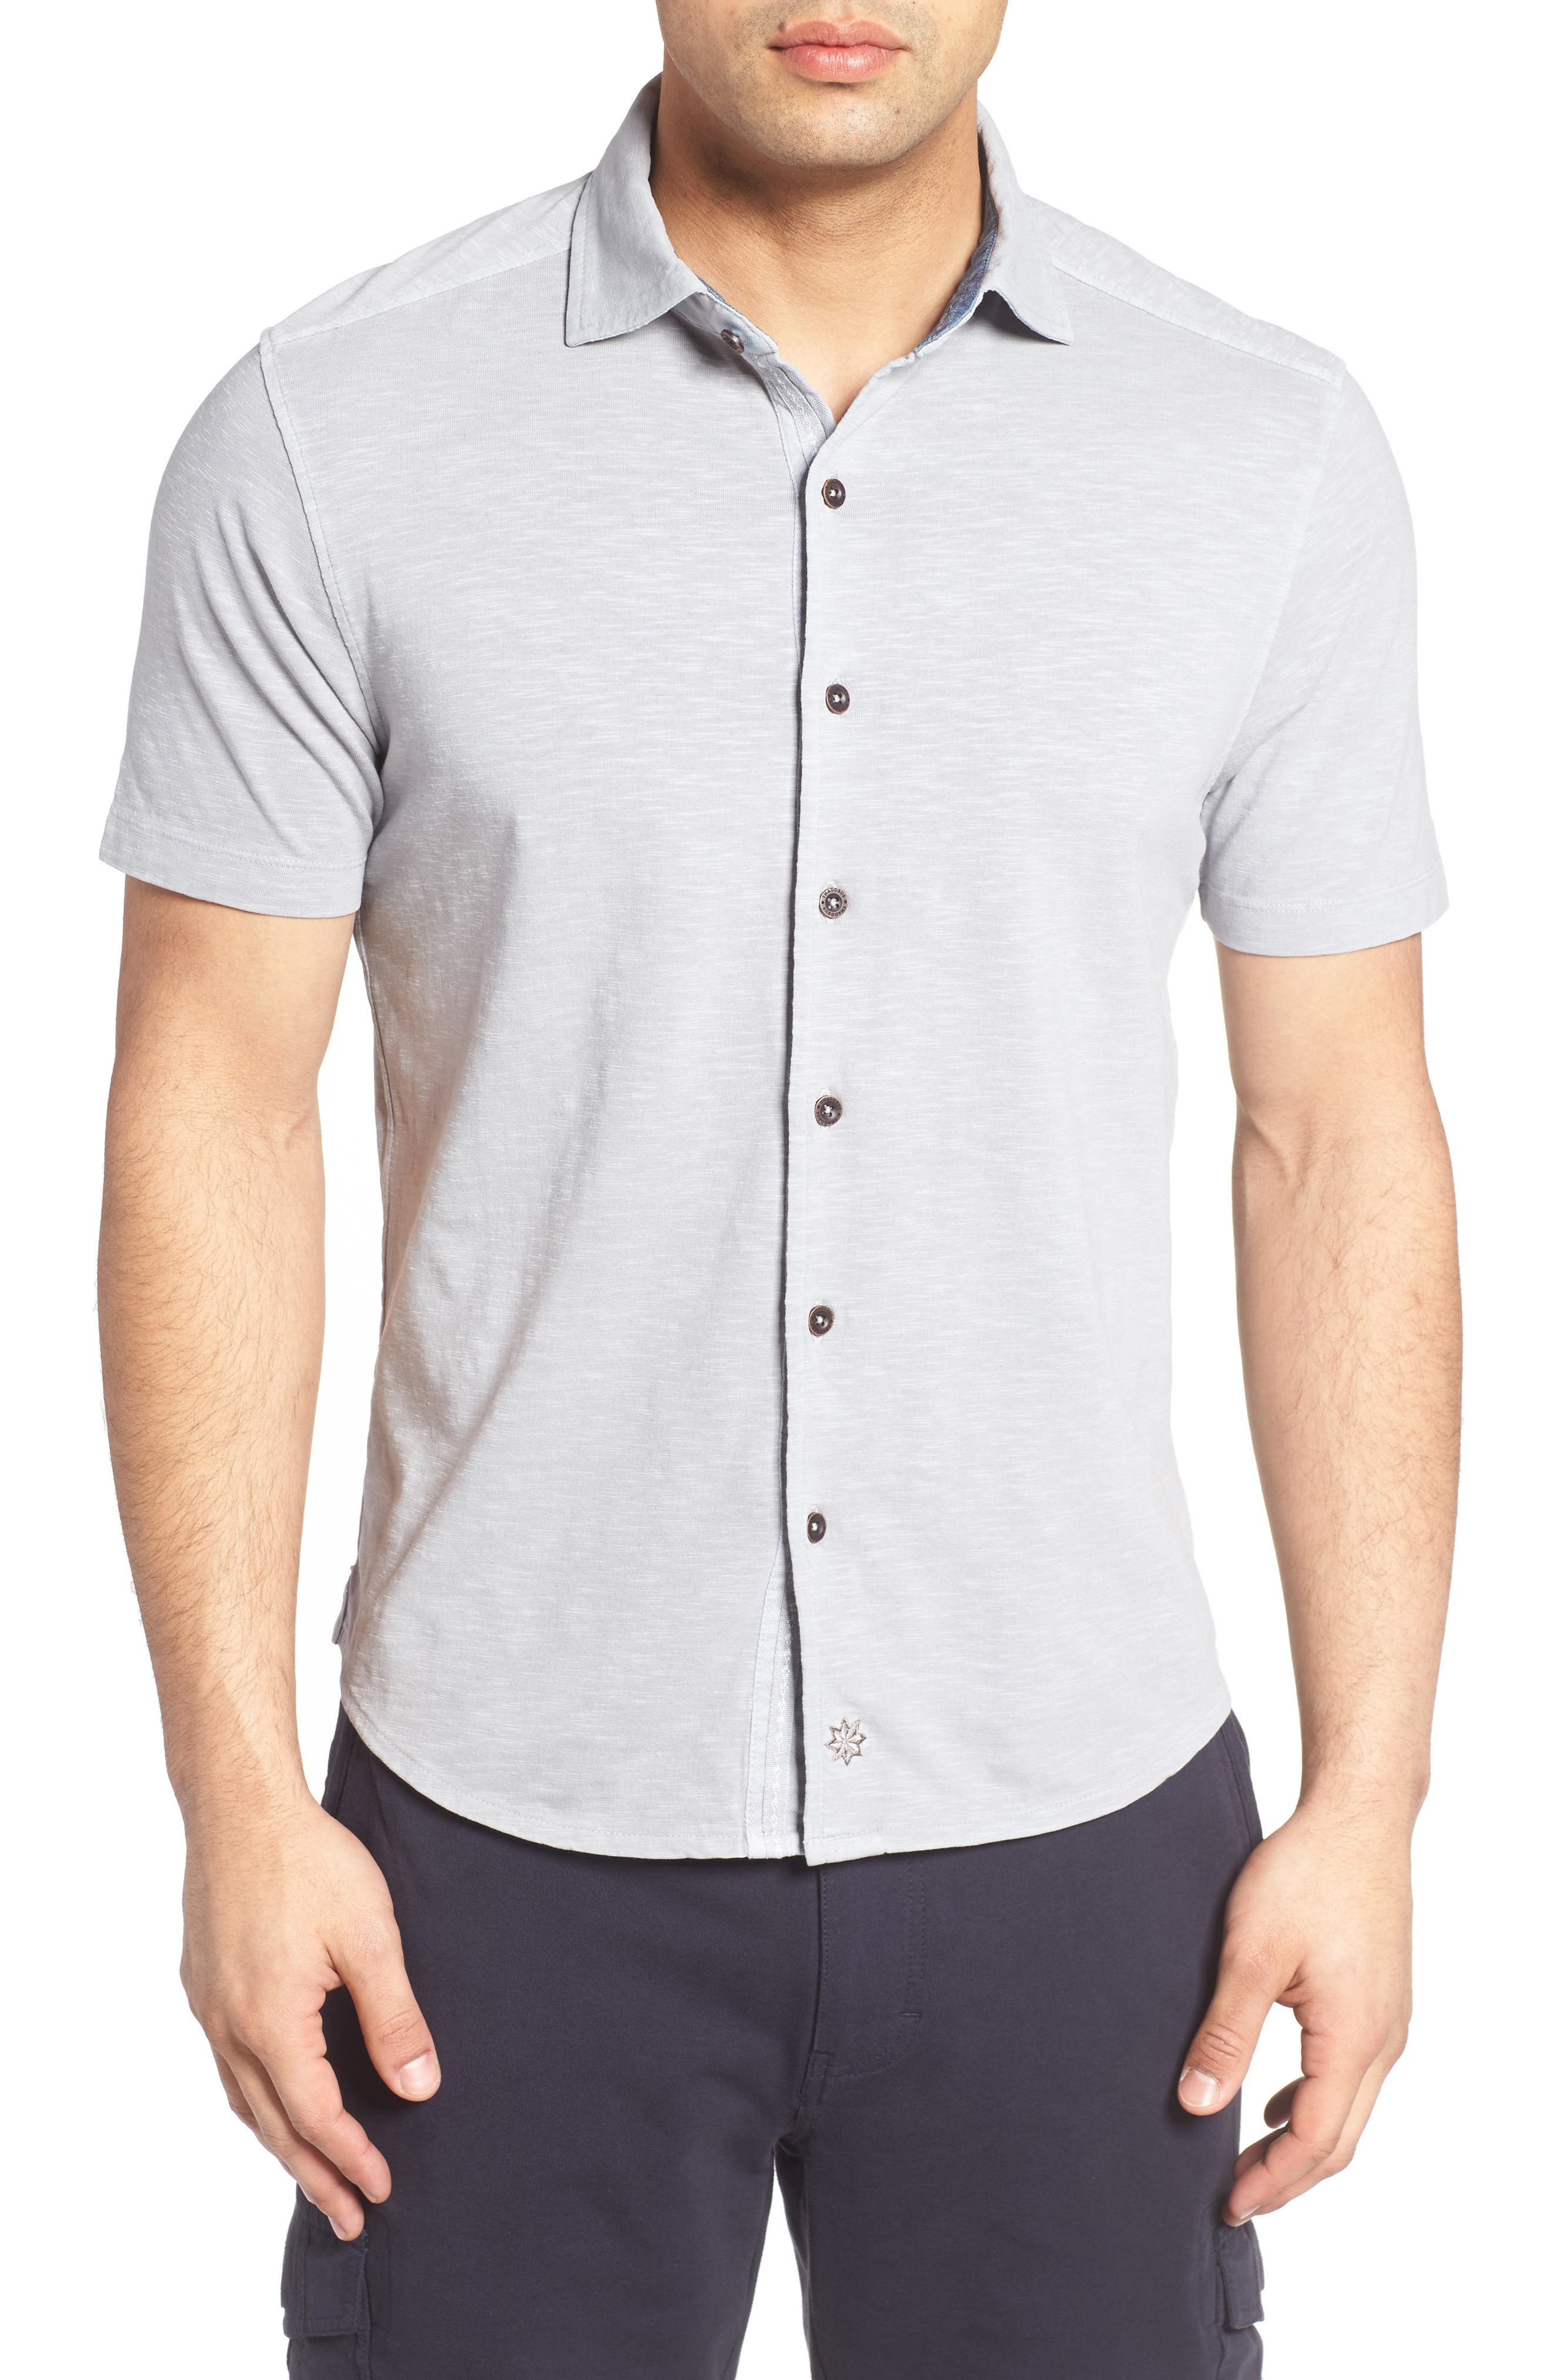 McAdams Slub Jersey Sport Shirt,                         Main,                         color, 020